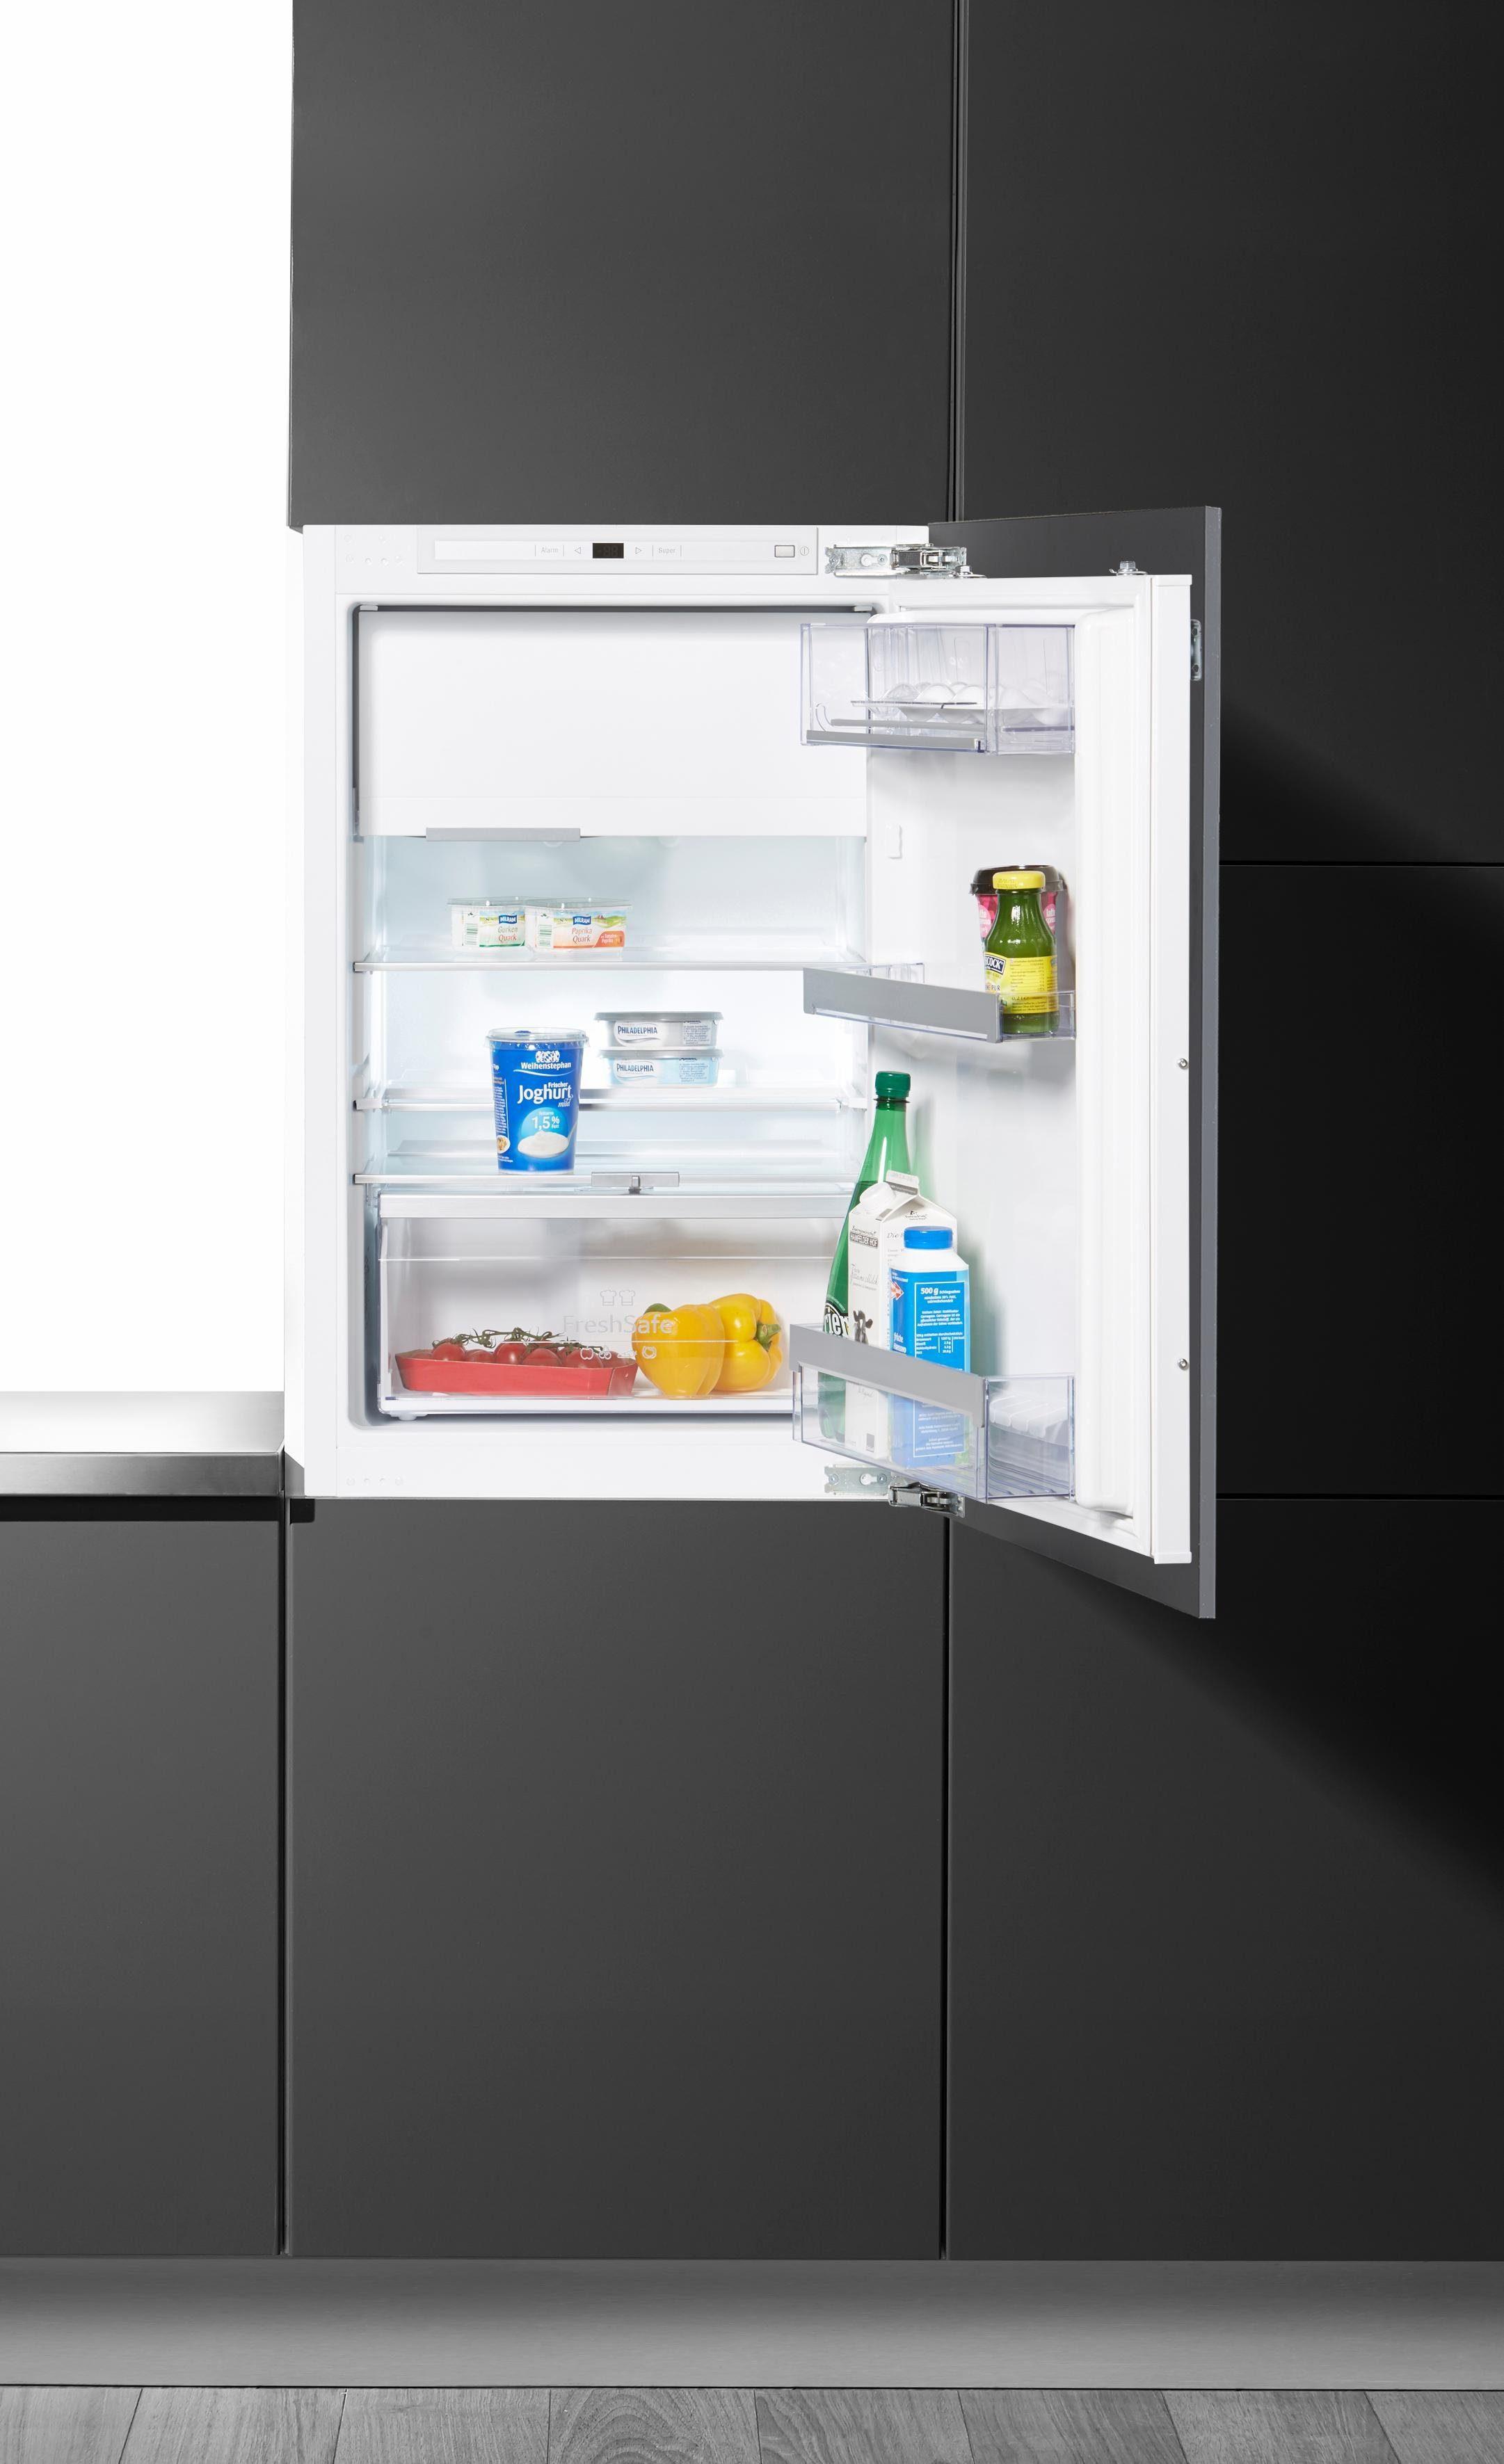 Neff Integrierbarer Einbaukühlschrank K246A3 / KI2223D40